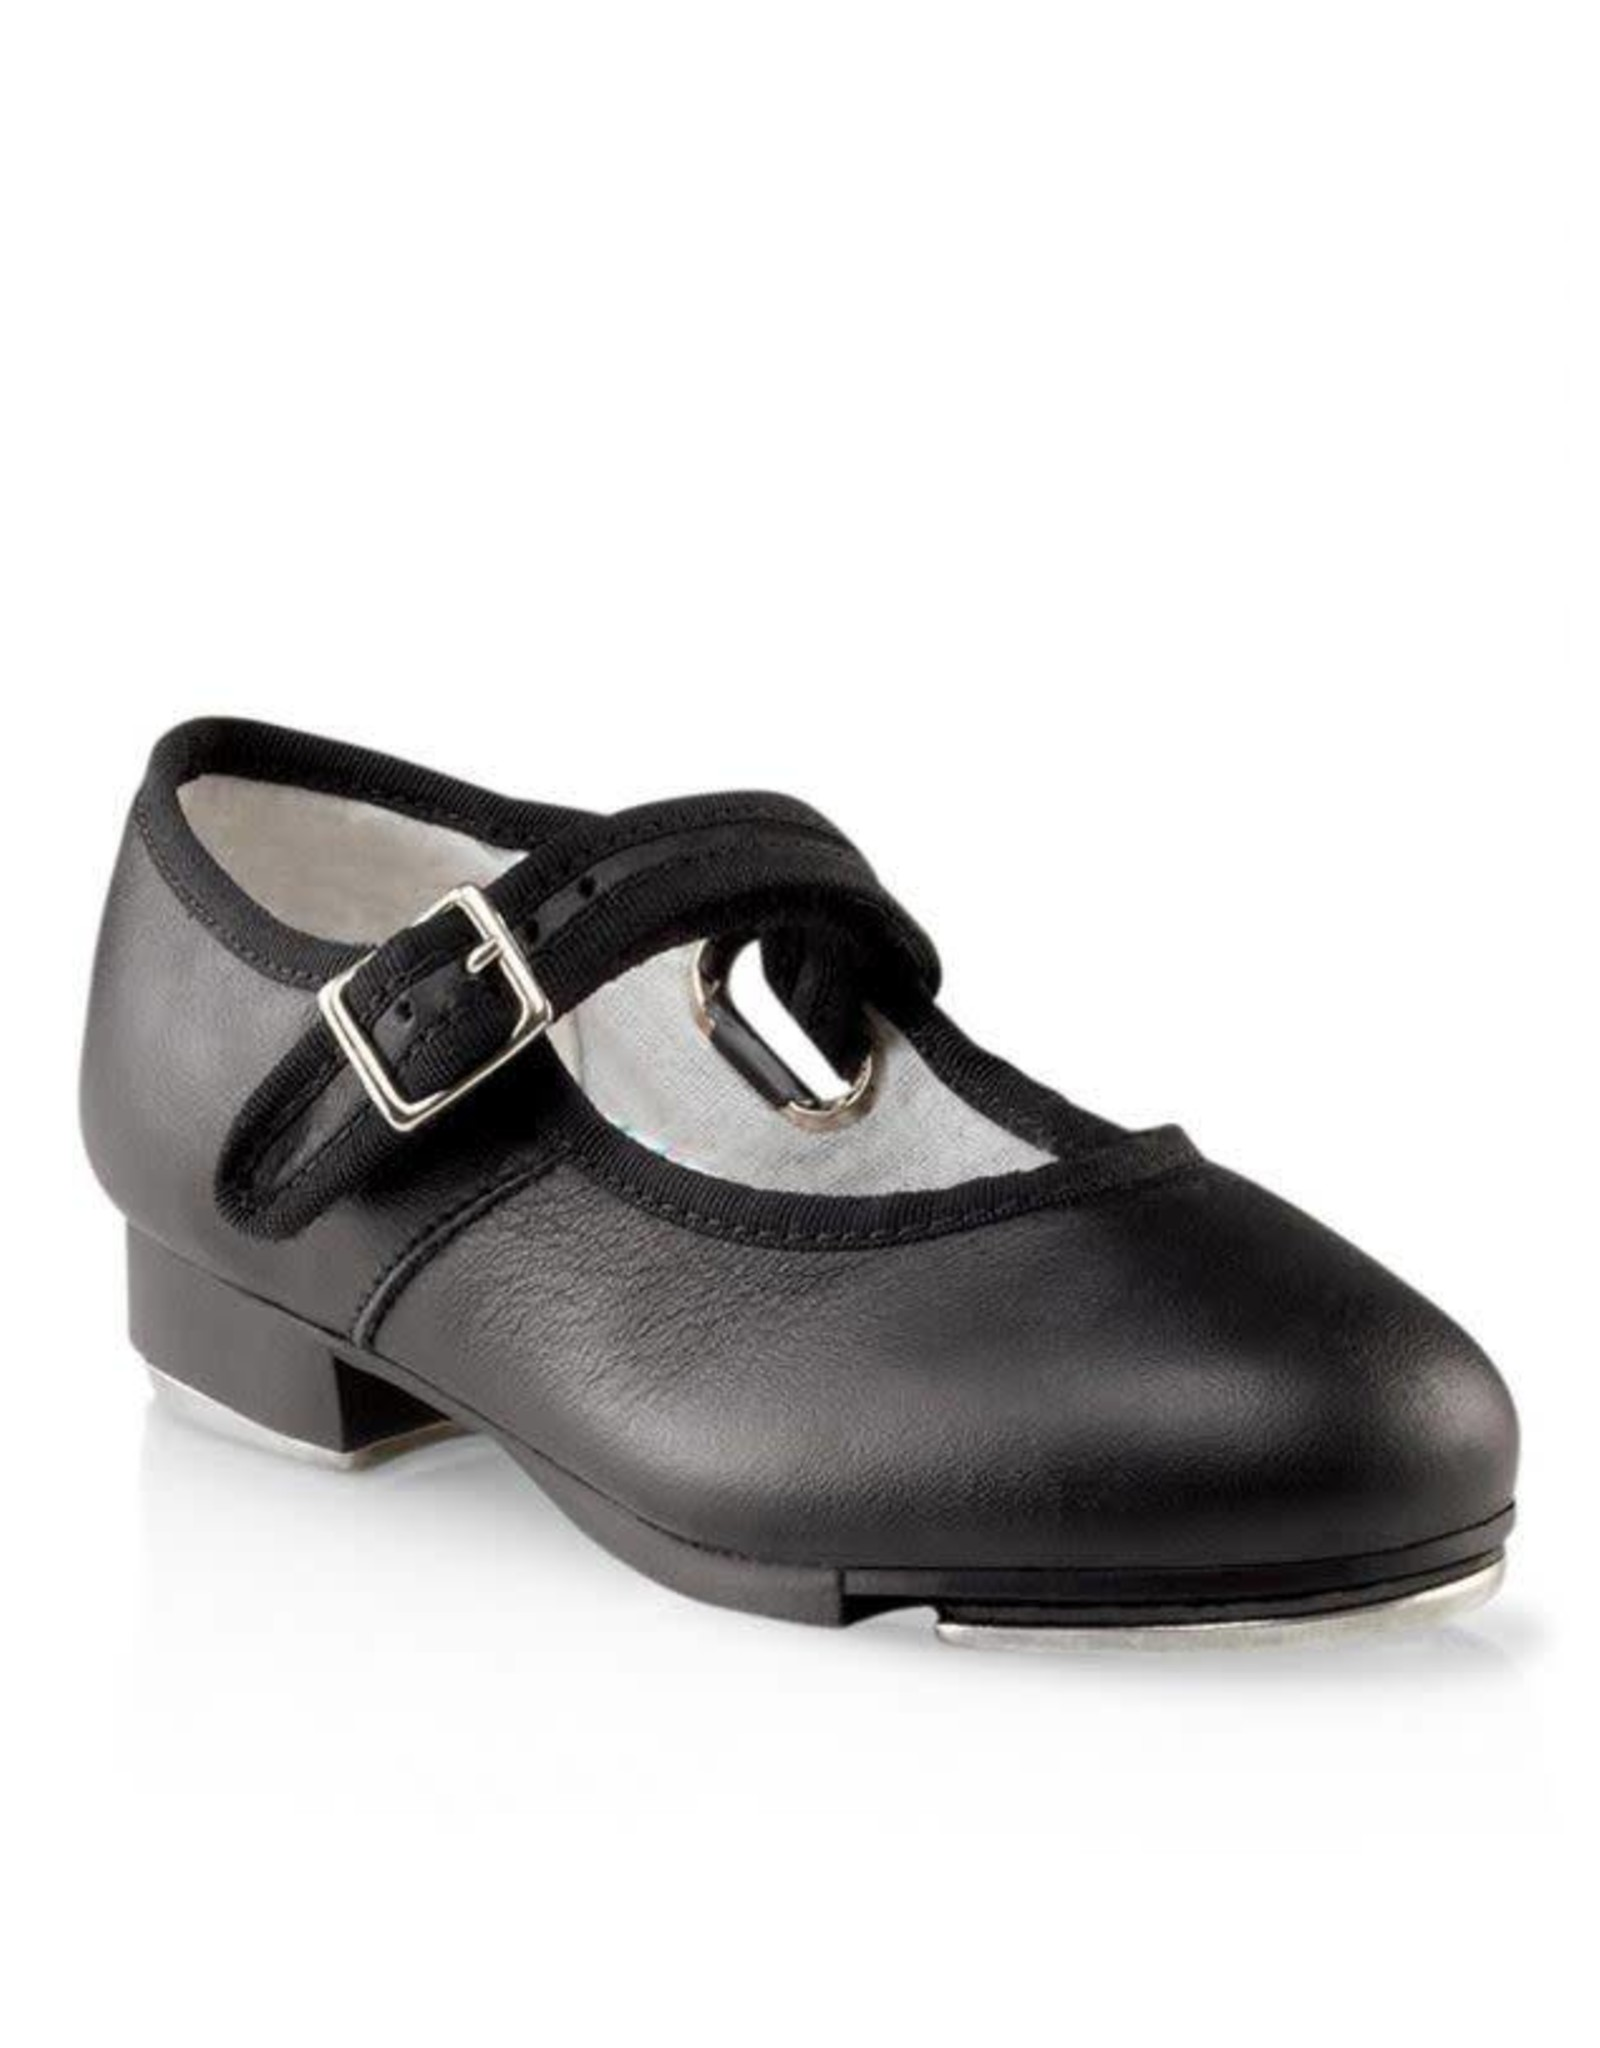 Capezio 3800C Mary Jane Tap Shoe BLACK